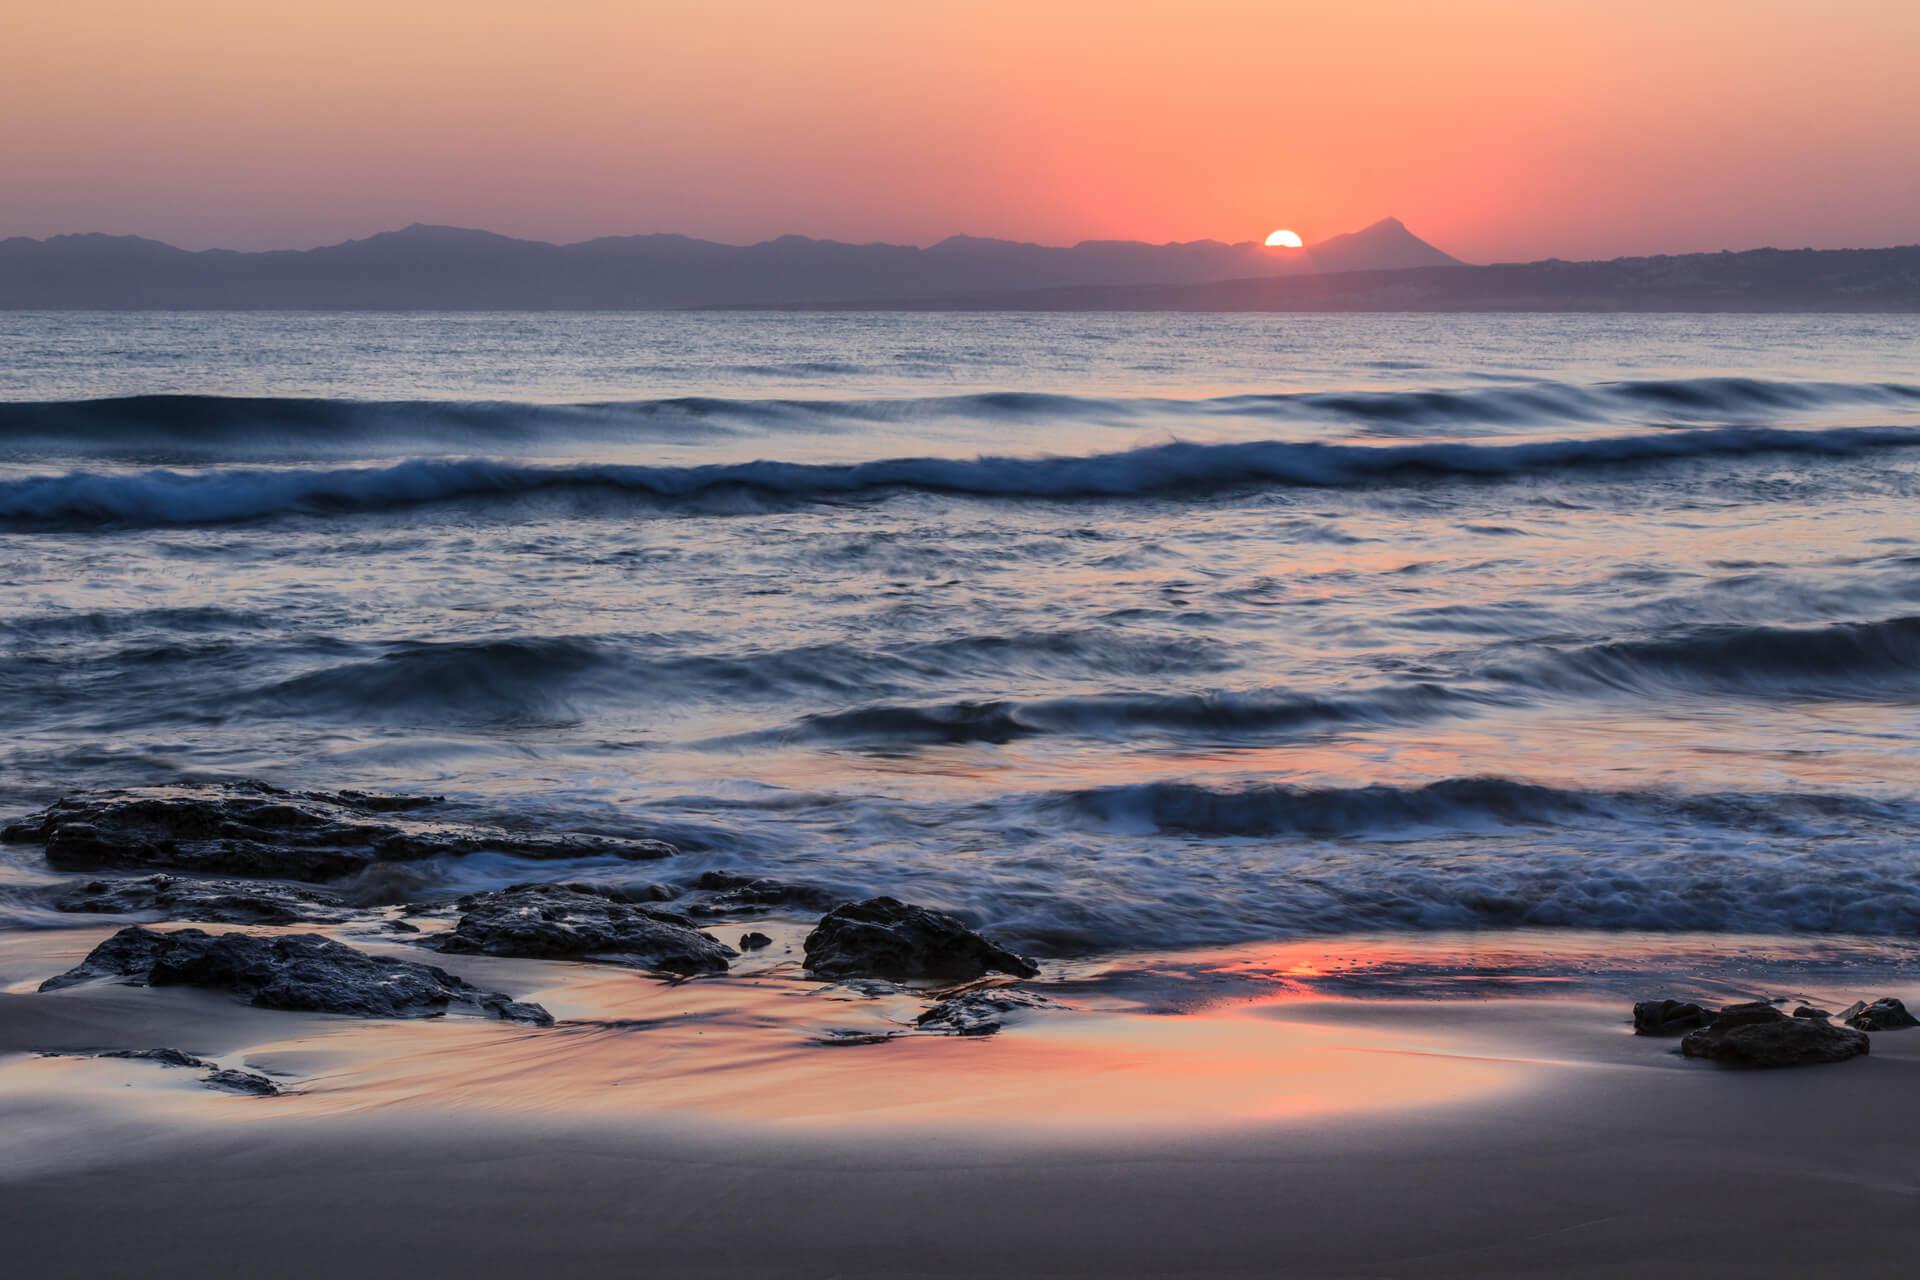 Elite Crete - Luxury Tourism in Chania, Crete - Sunrise